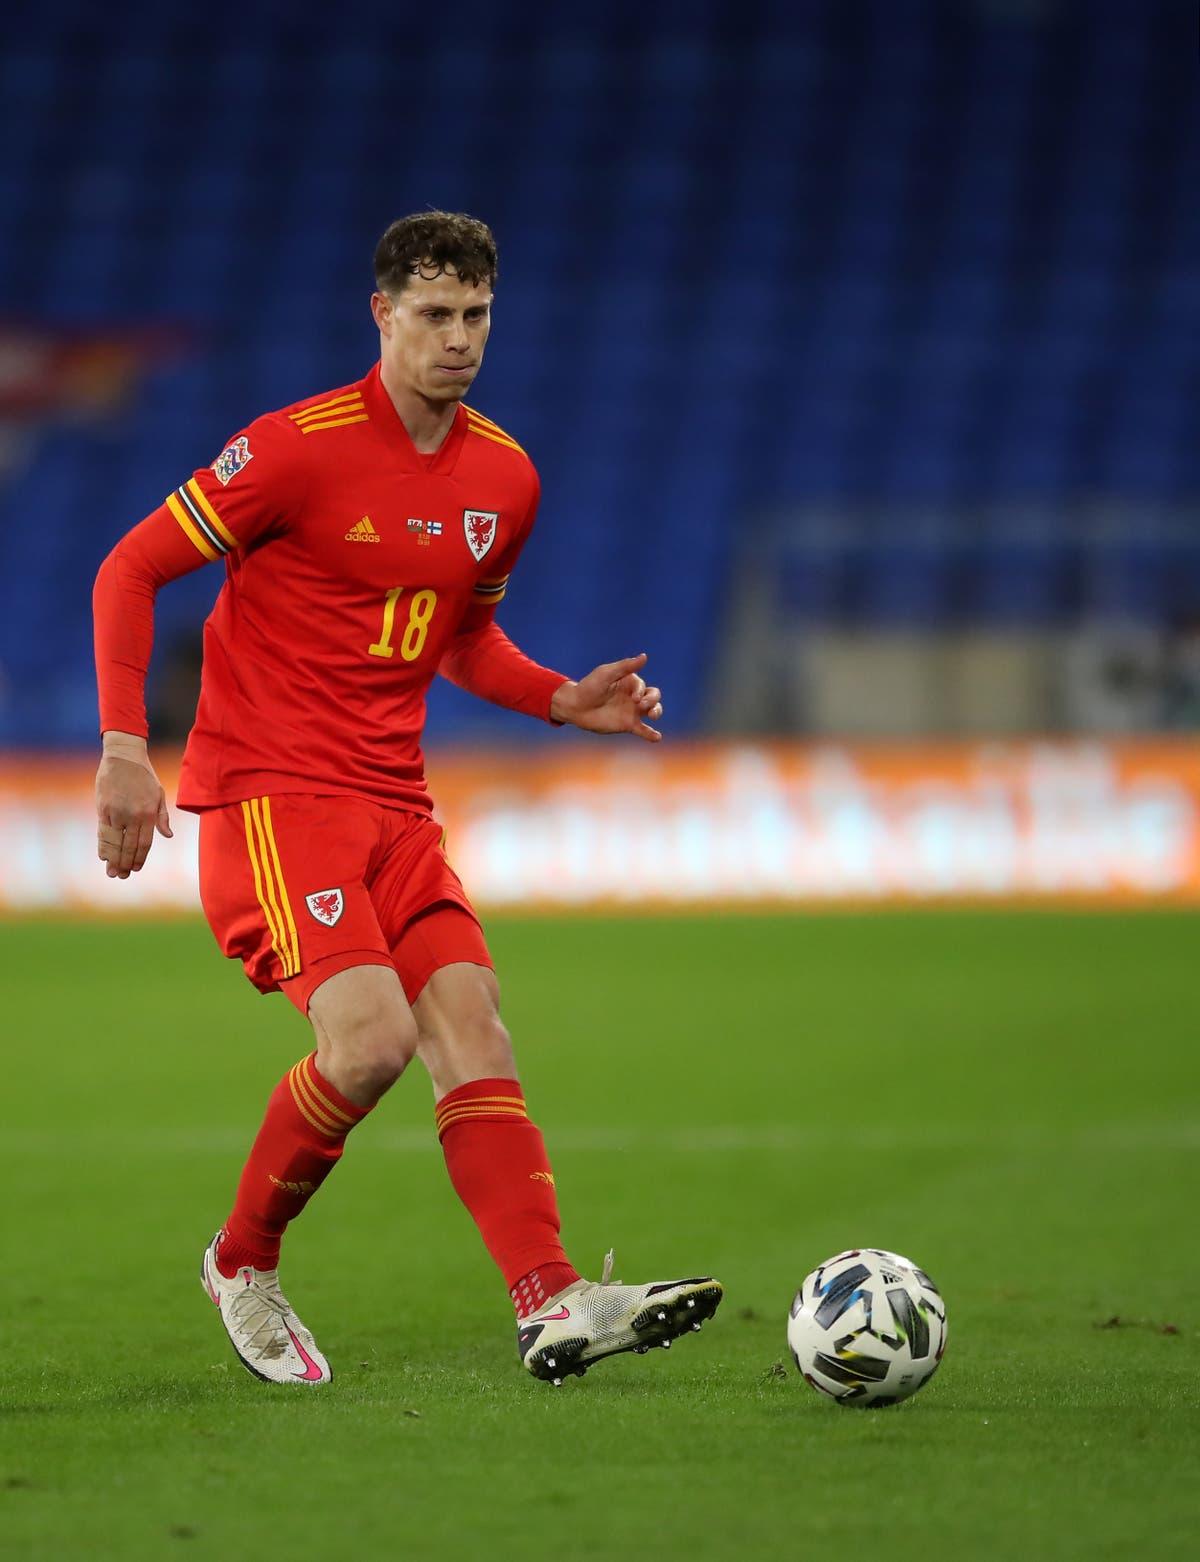 St Pauli star James Lawrence would relish Wales v Germany clash at Euro 2020